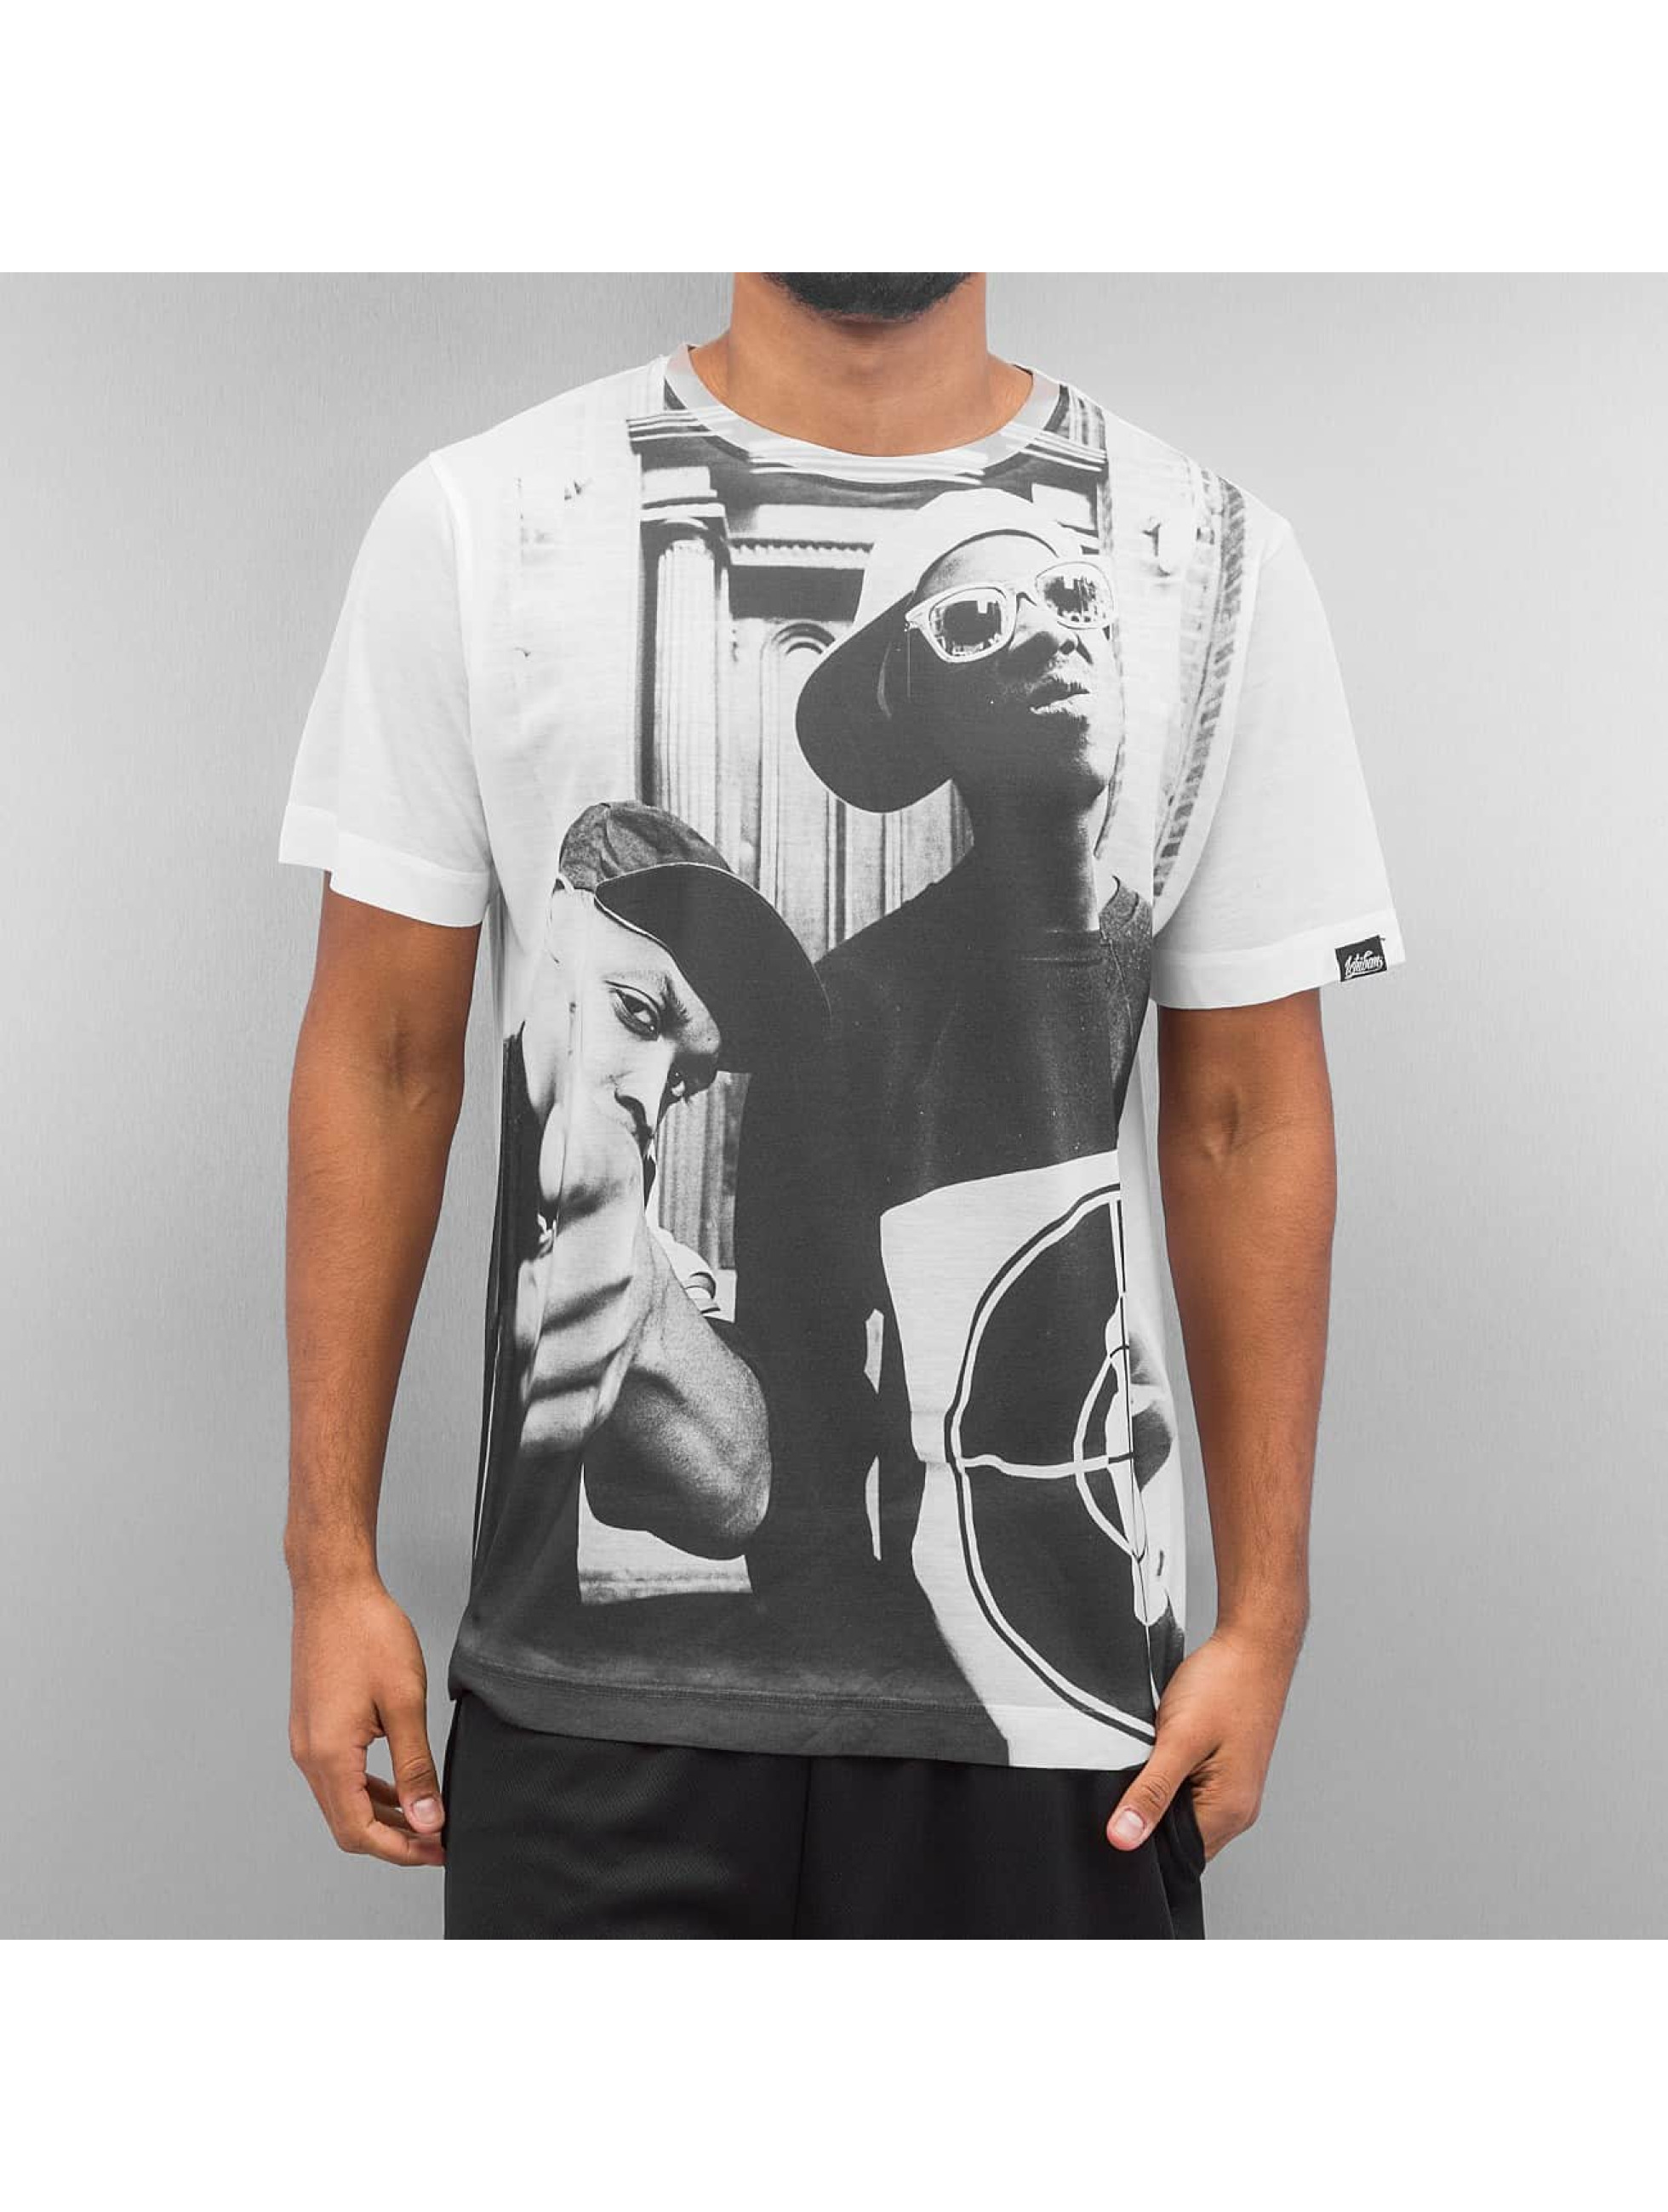 Ichiban T-Shirt Hip Hop New York 82 white